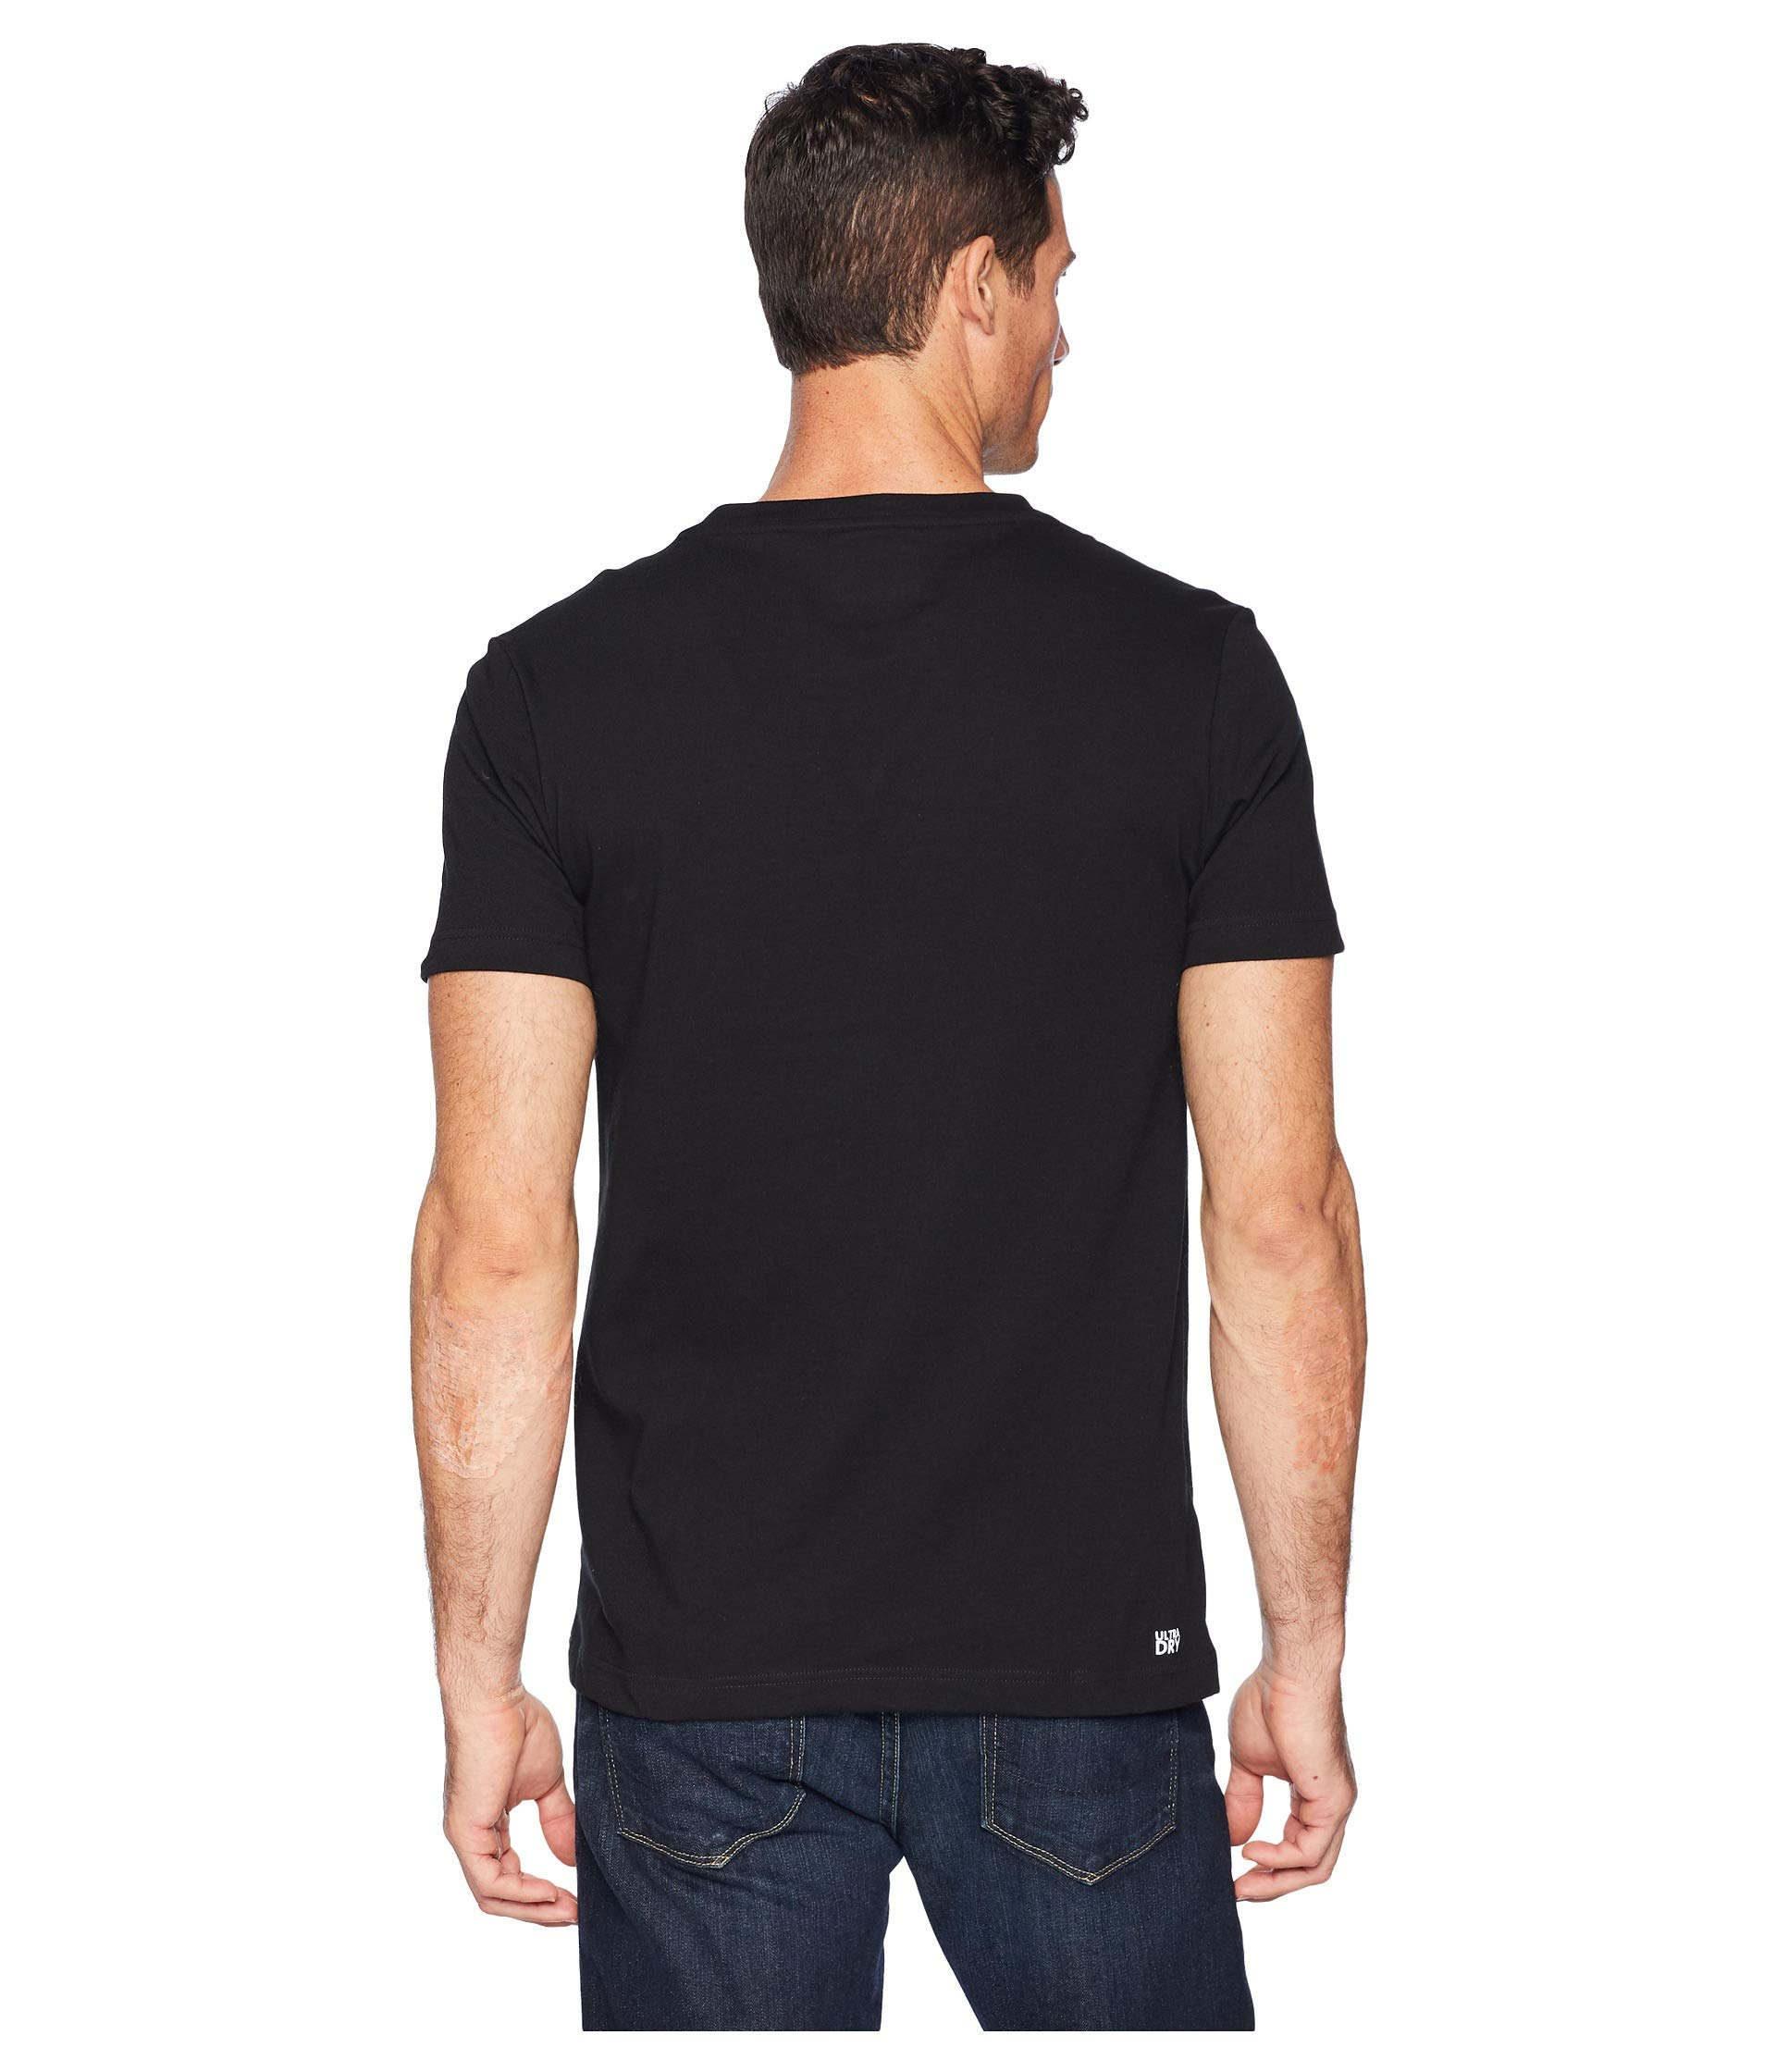 Sleeve Novak white Graphic Sport Lacoste Black Djokovic Jersey Swift Hand Short wtOERqOC